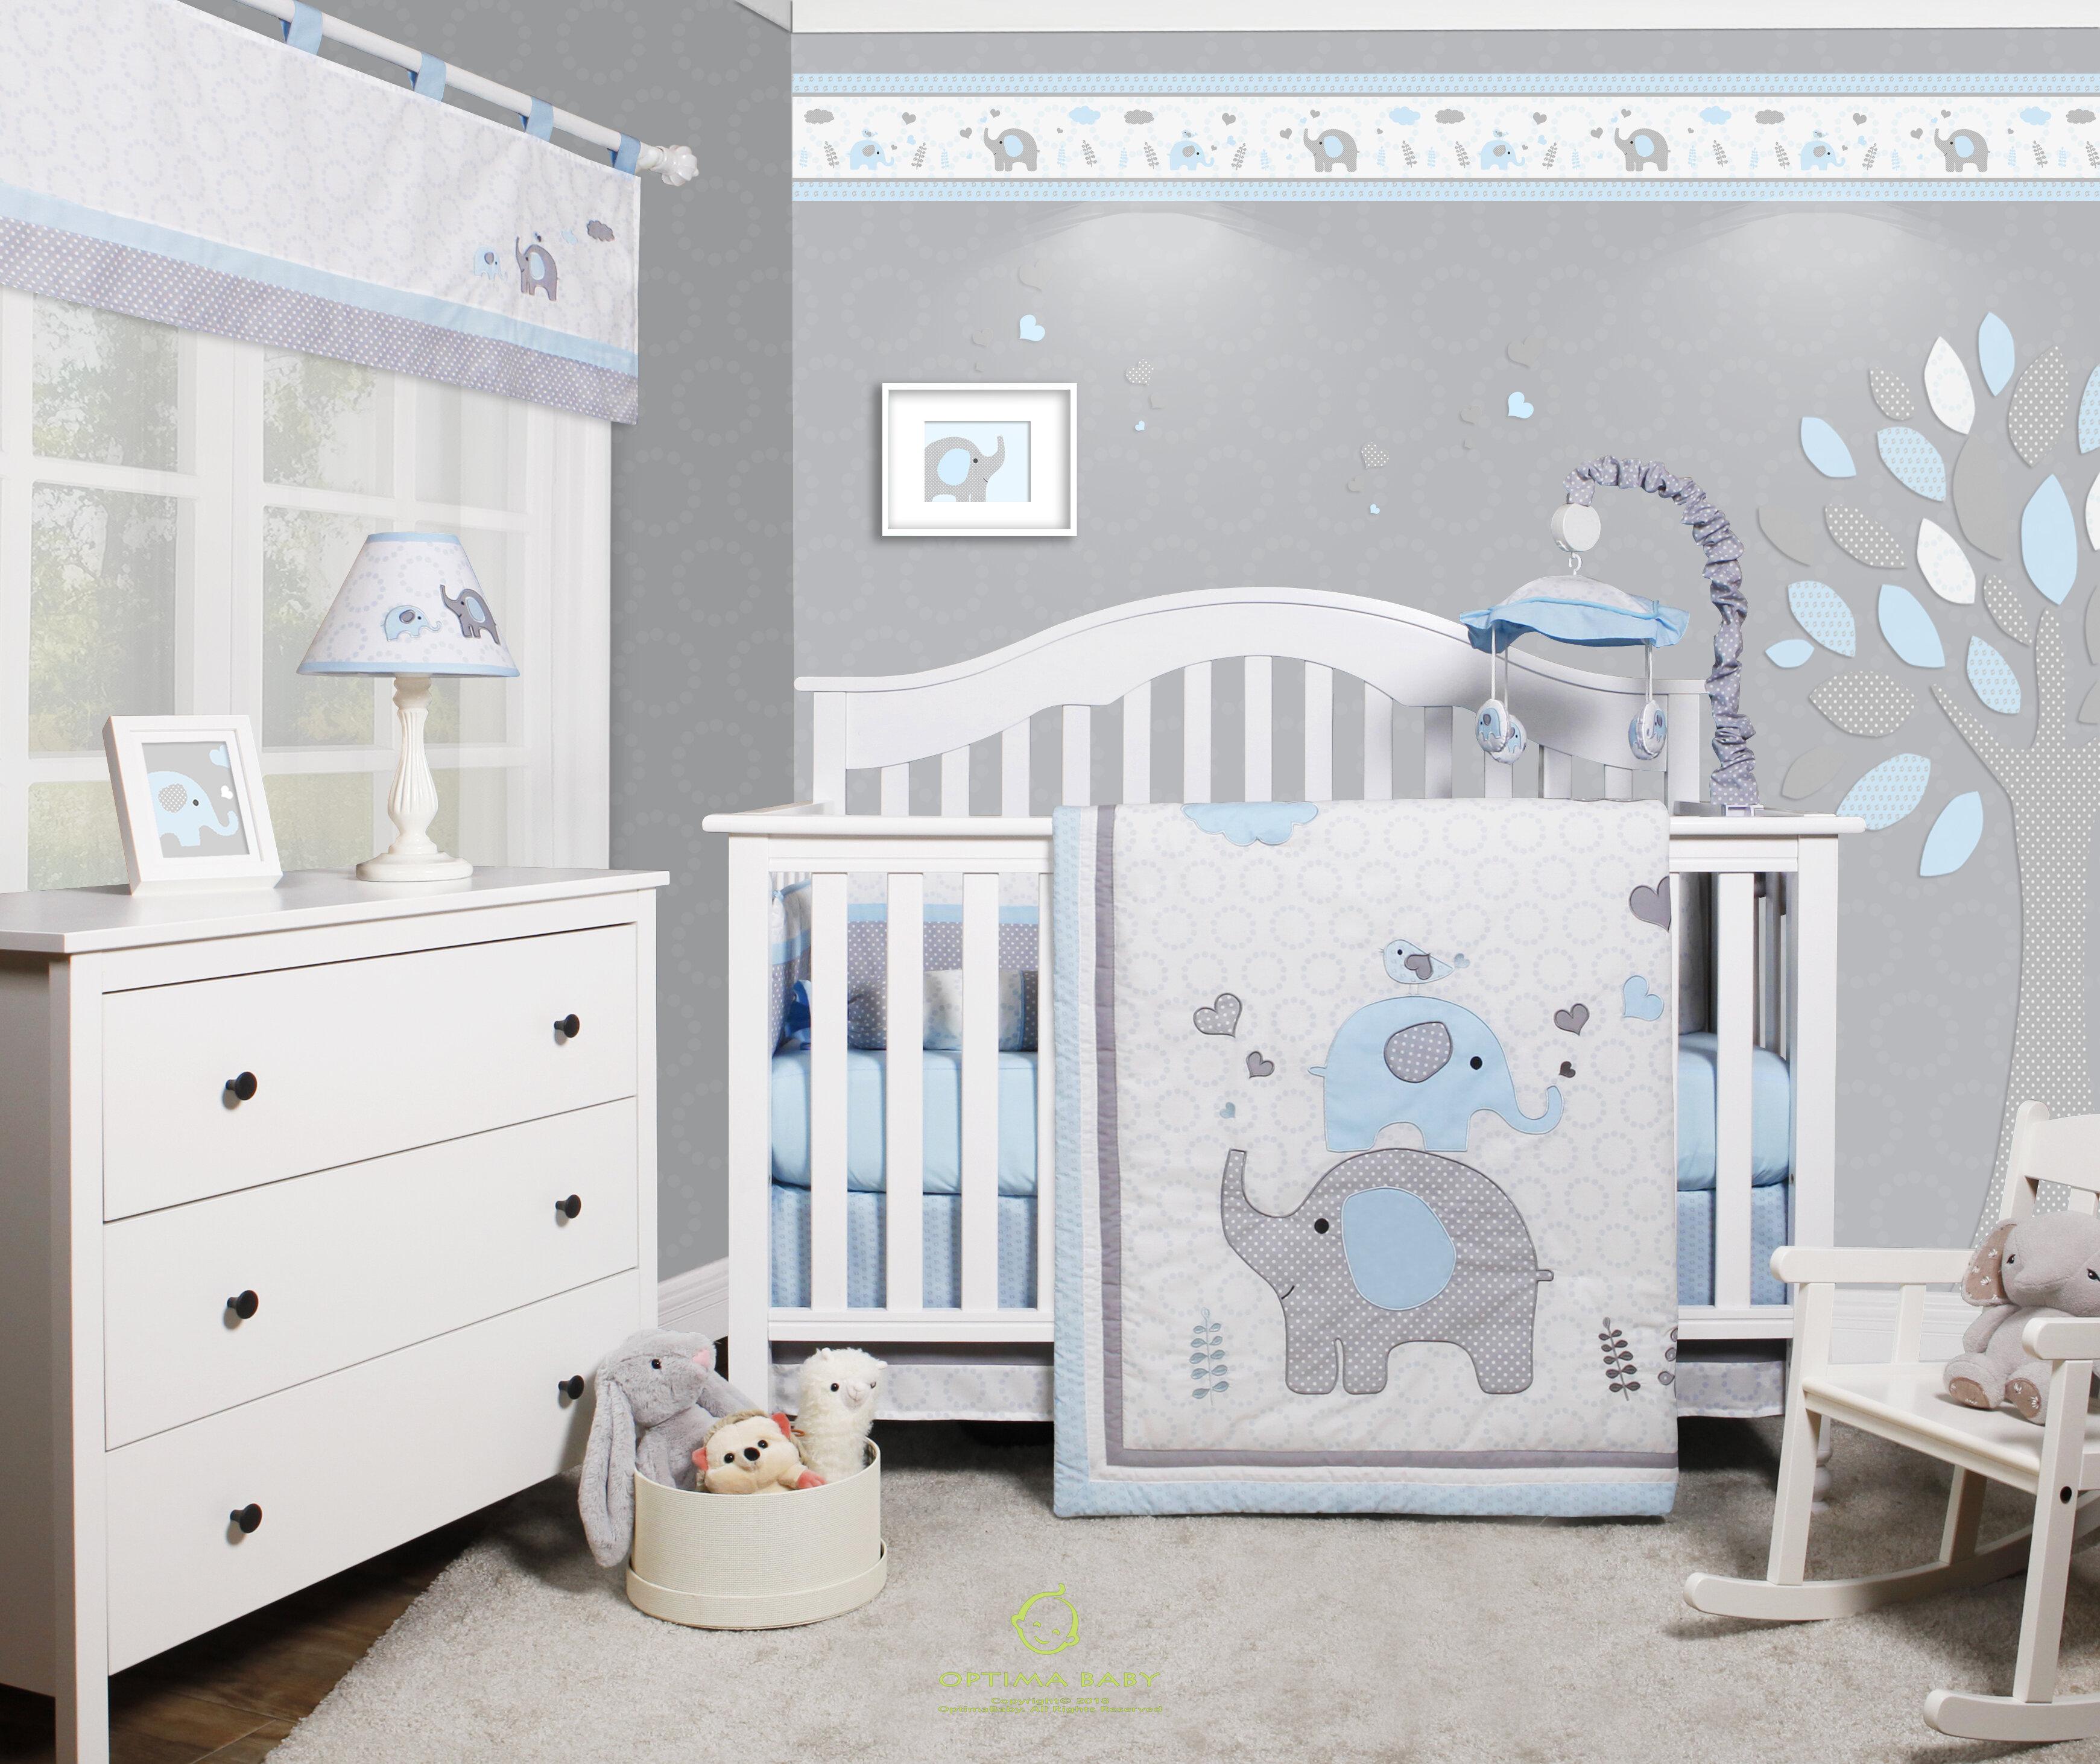 Harriet Bee Penney Elephant Baby Nursery 6 Piece Crib Bedding Set u0026 Reviews  | Wayfair